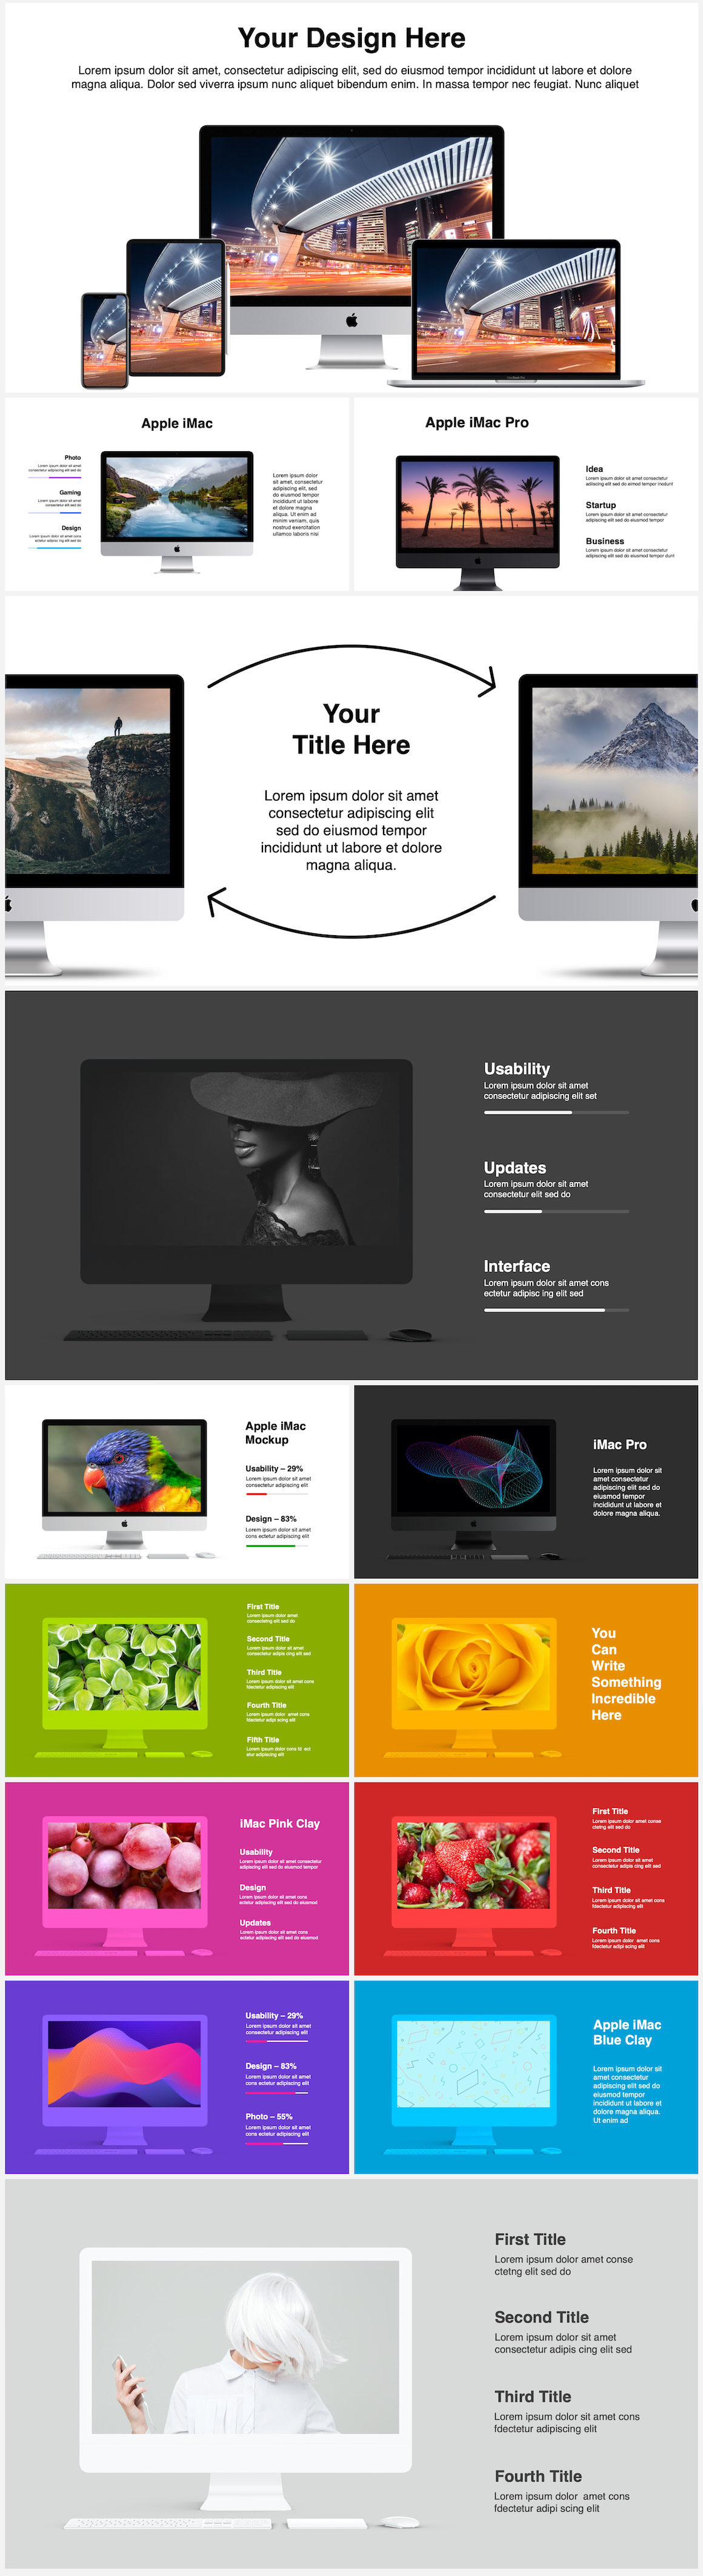 Huge Infographics Bundle! Lifetime Updates! PowerPoint, Photoshop, Illustrator. - 52